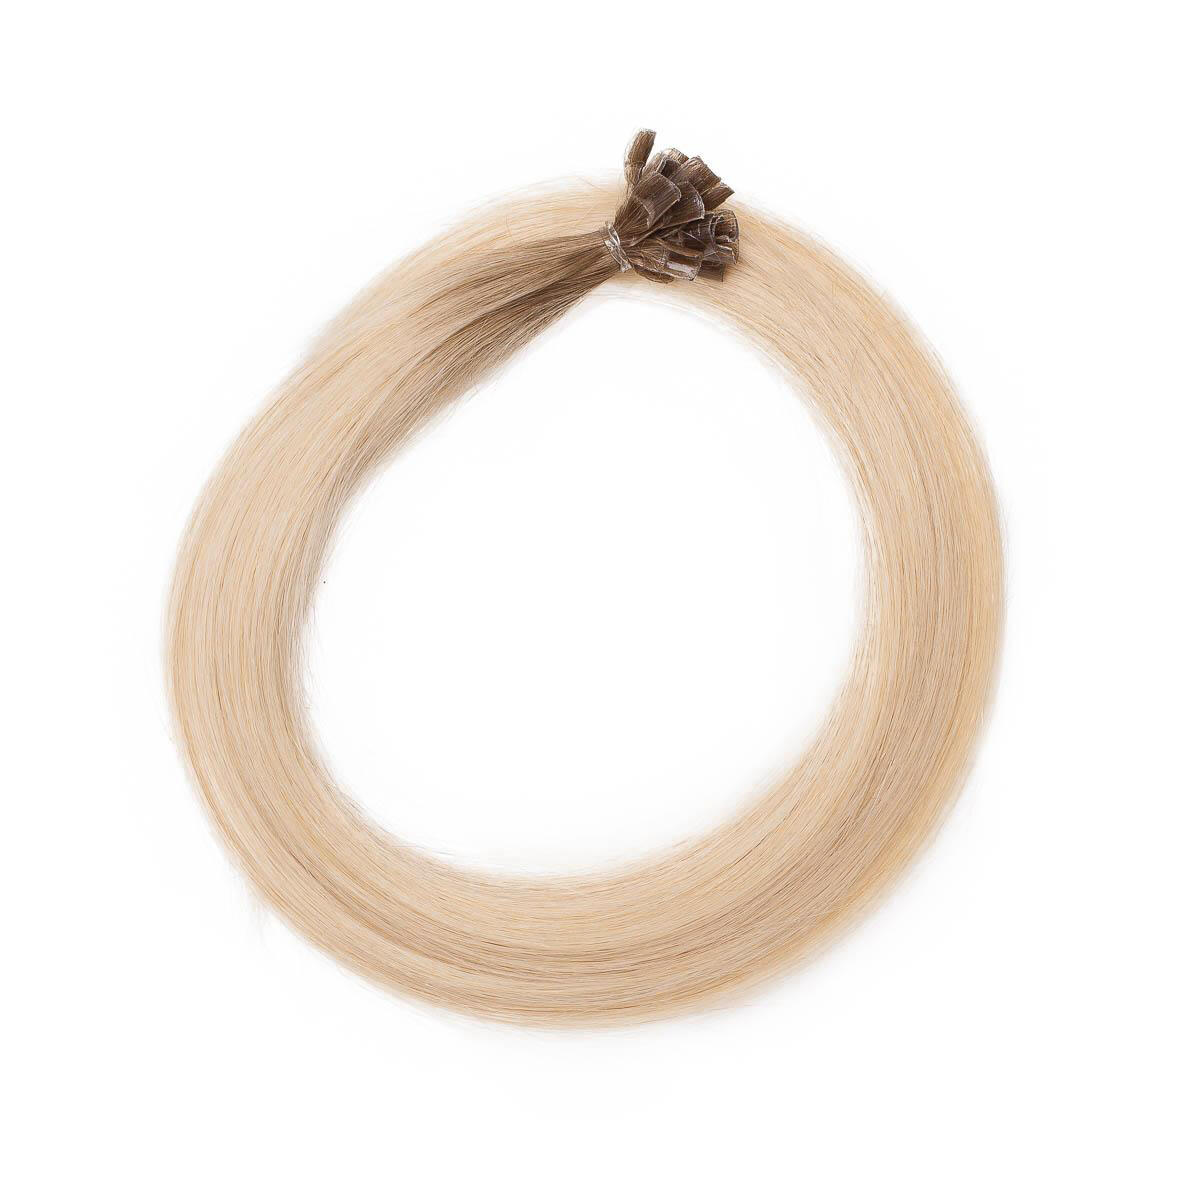 Nail Hair Original R7.3/8.0 Cendre Golden Blonde Root 40 cm